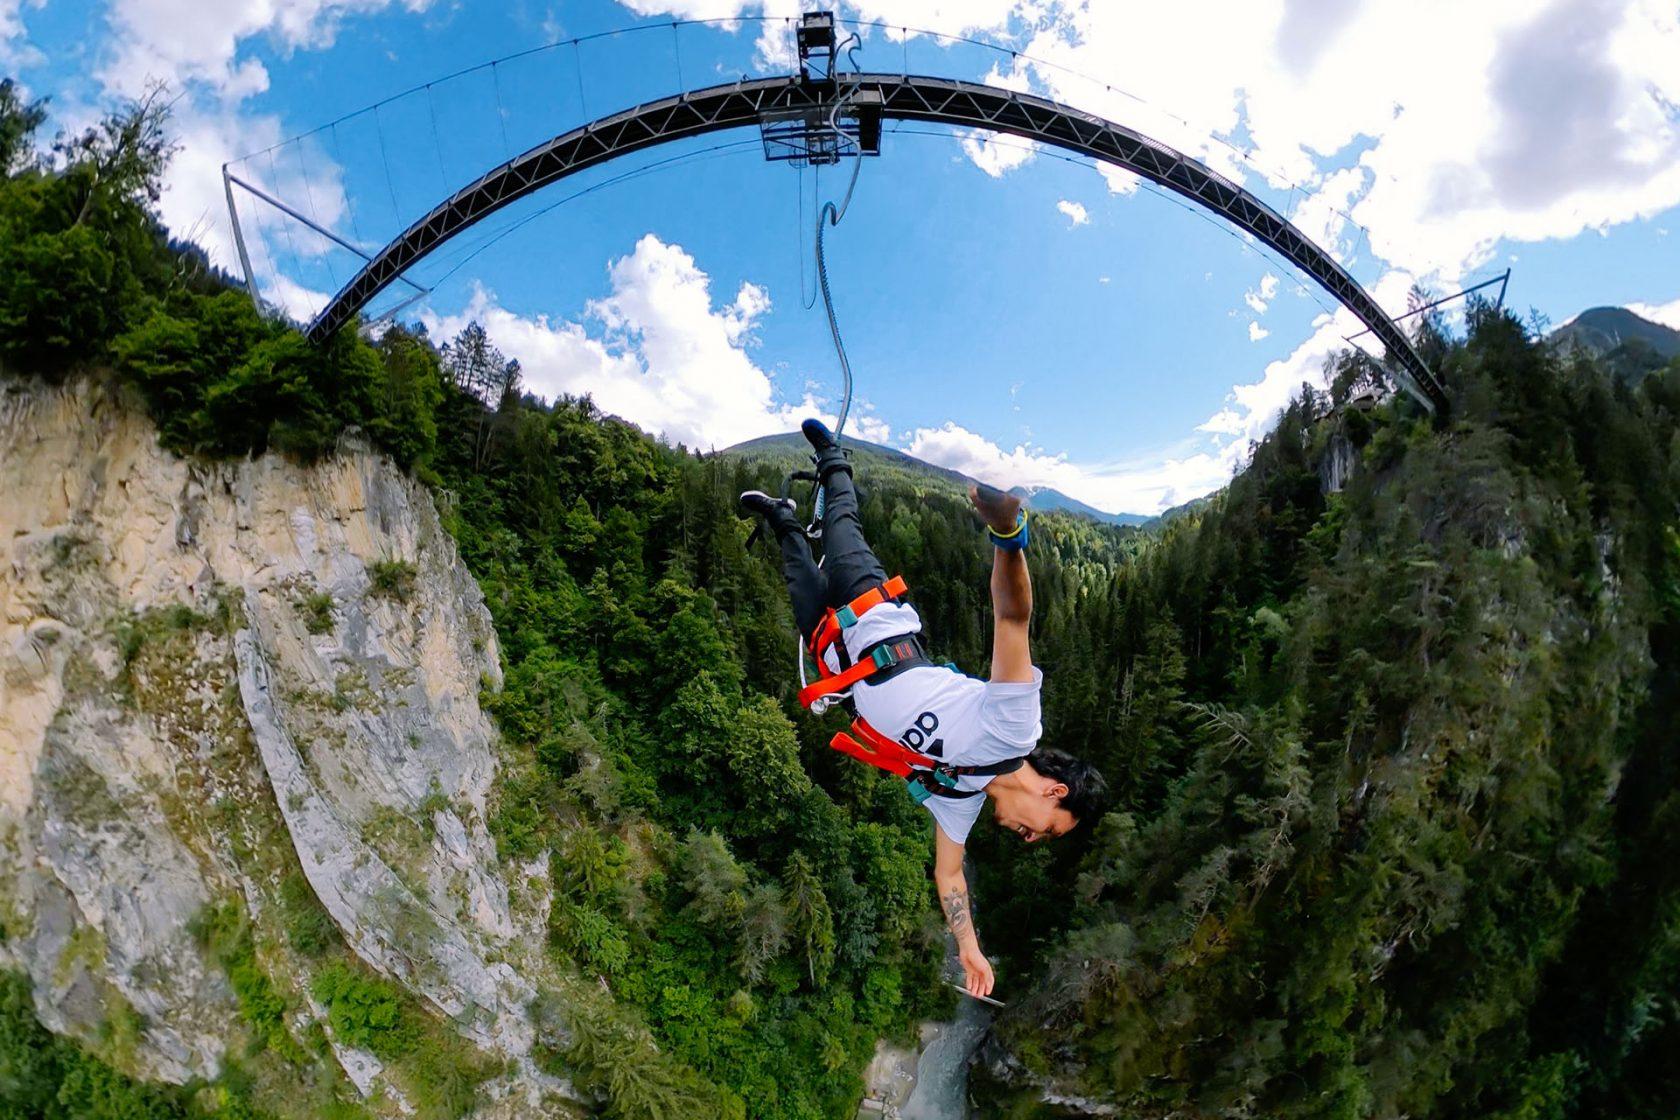 Bungy Jumping at the Benni - Raich - Bridge